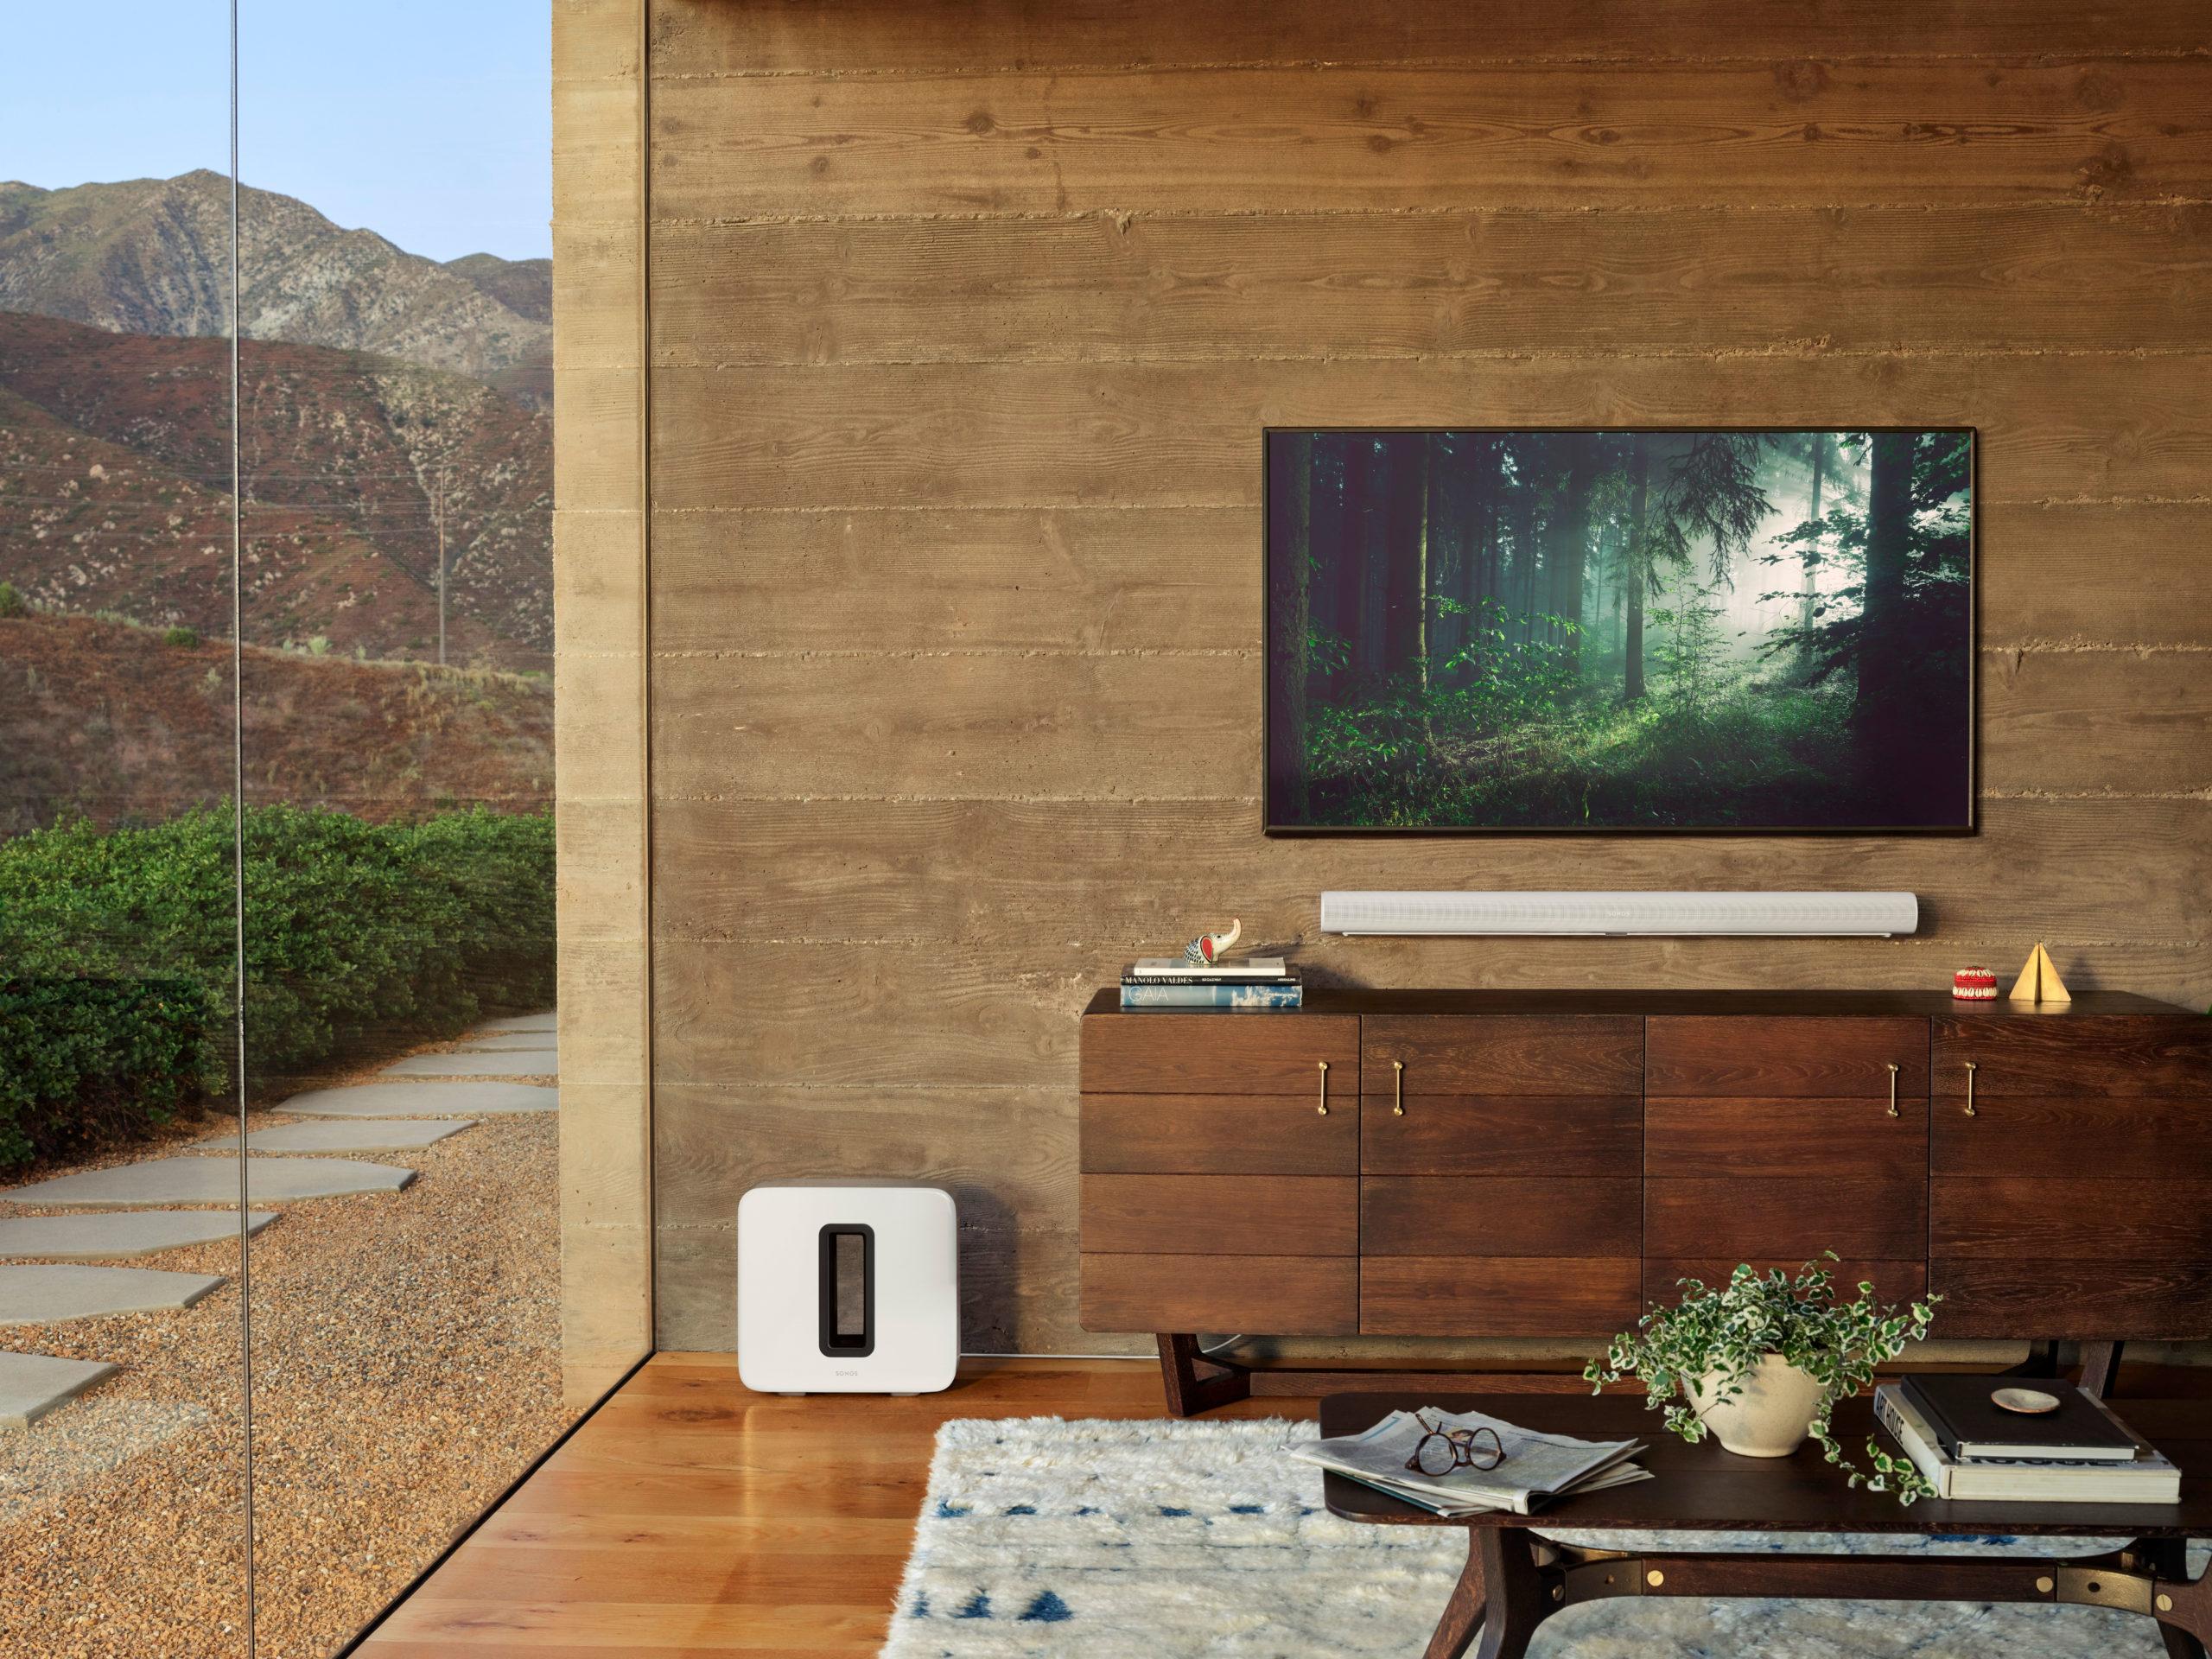 Sonos Arc kann Dolby Atmos, HDMI und hat Amazon Alexa und Google Assistant an Bord